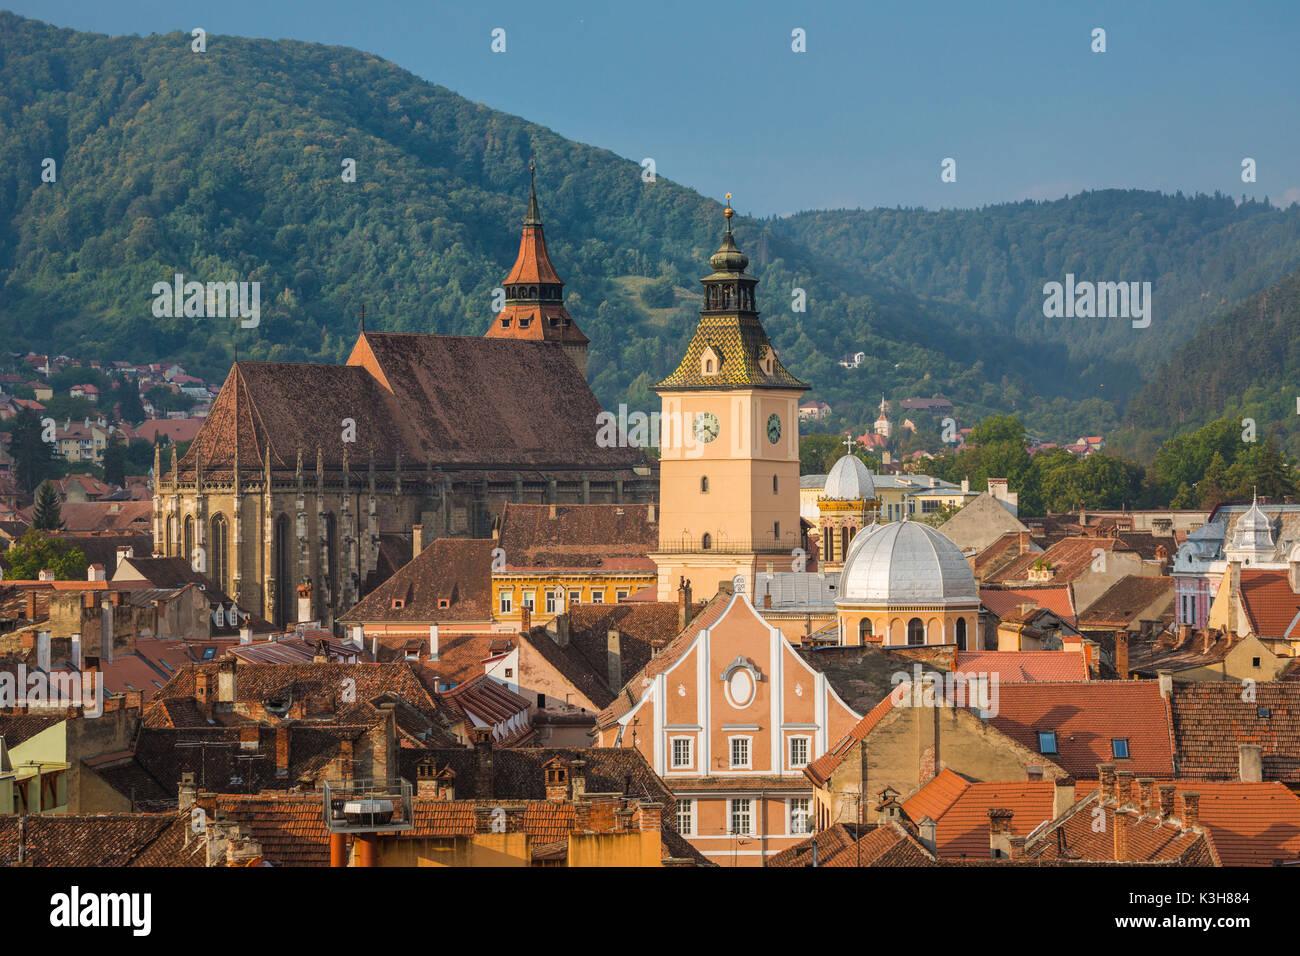 Romania, Transilvania, Brasow City The Black Chur Roof Stock Photo